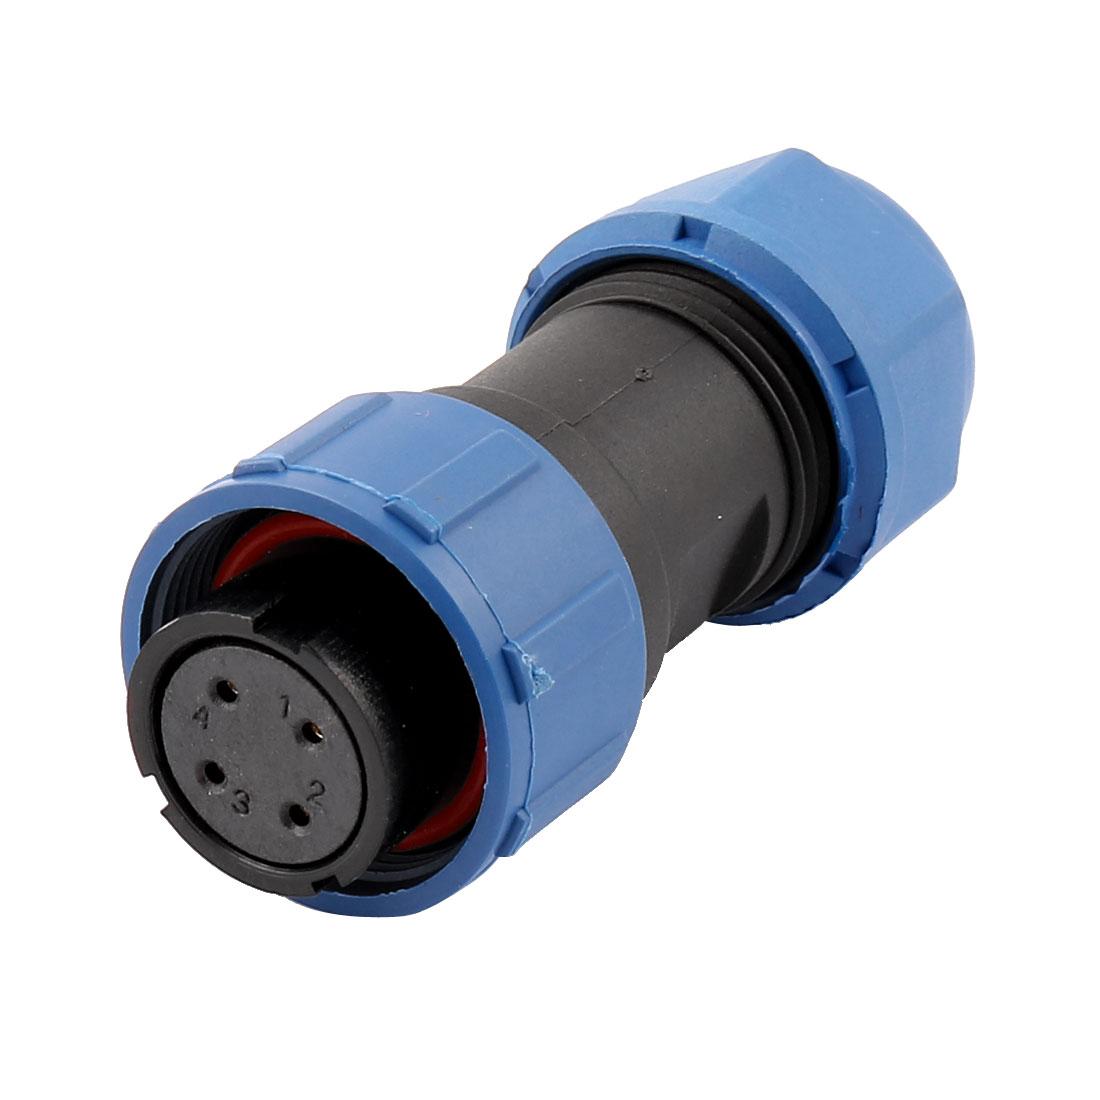 AC 500V 4 Poles SP1710/S Waterproof Aviation Socket Dustproof Adapter Connector